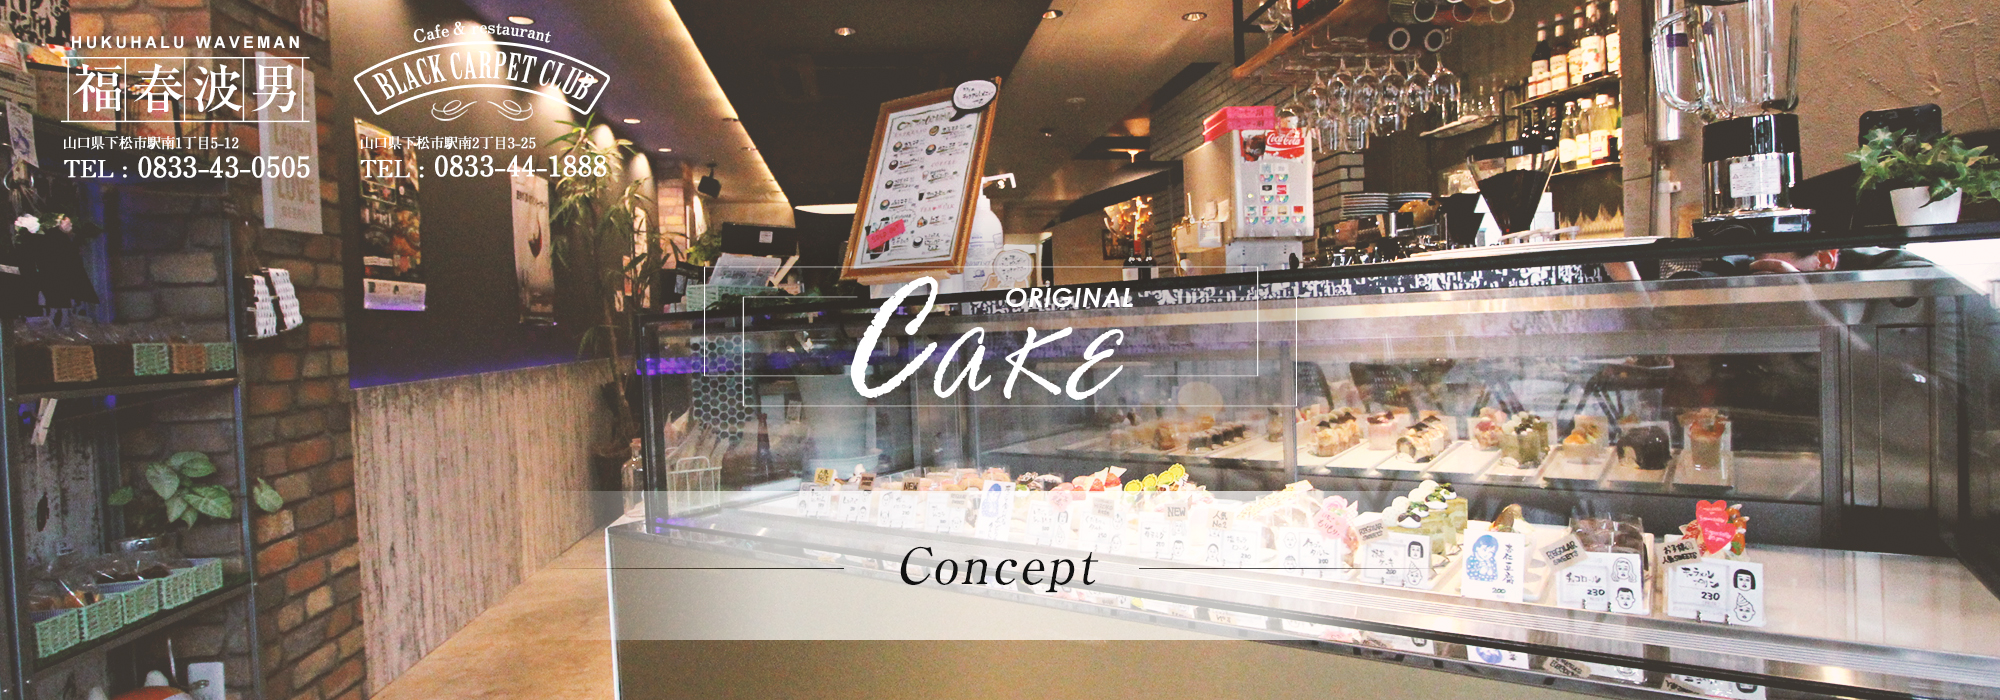 Concept/Cake